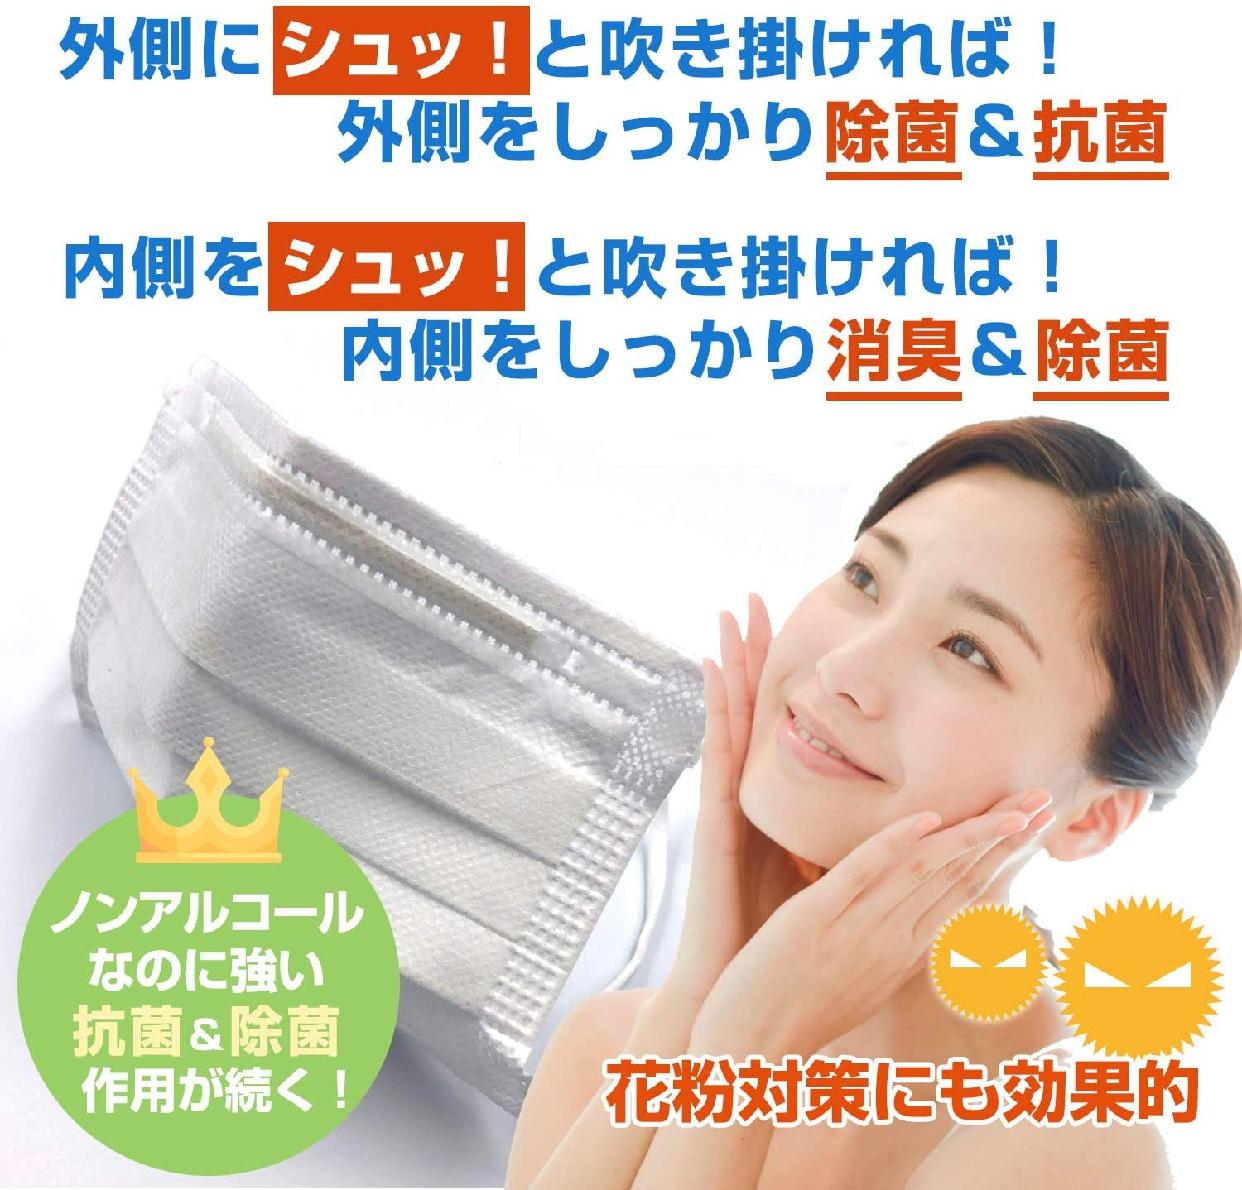 BBIT(ビビット)マスク用ZEROデオドラント抗菌・除菌・消臭剤スプレーの商品画像3